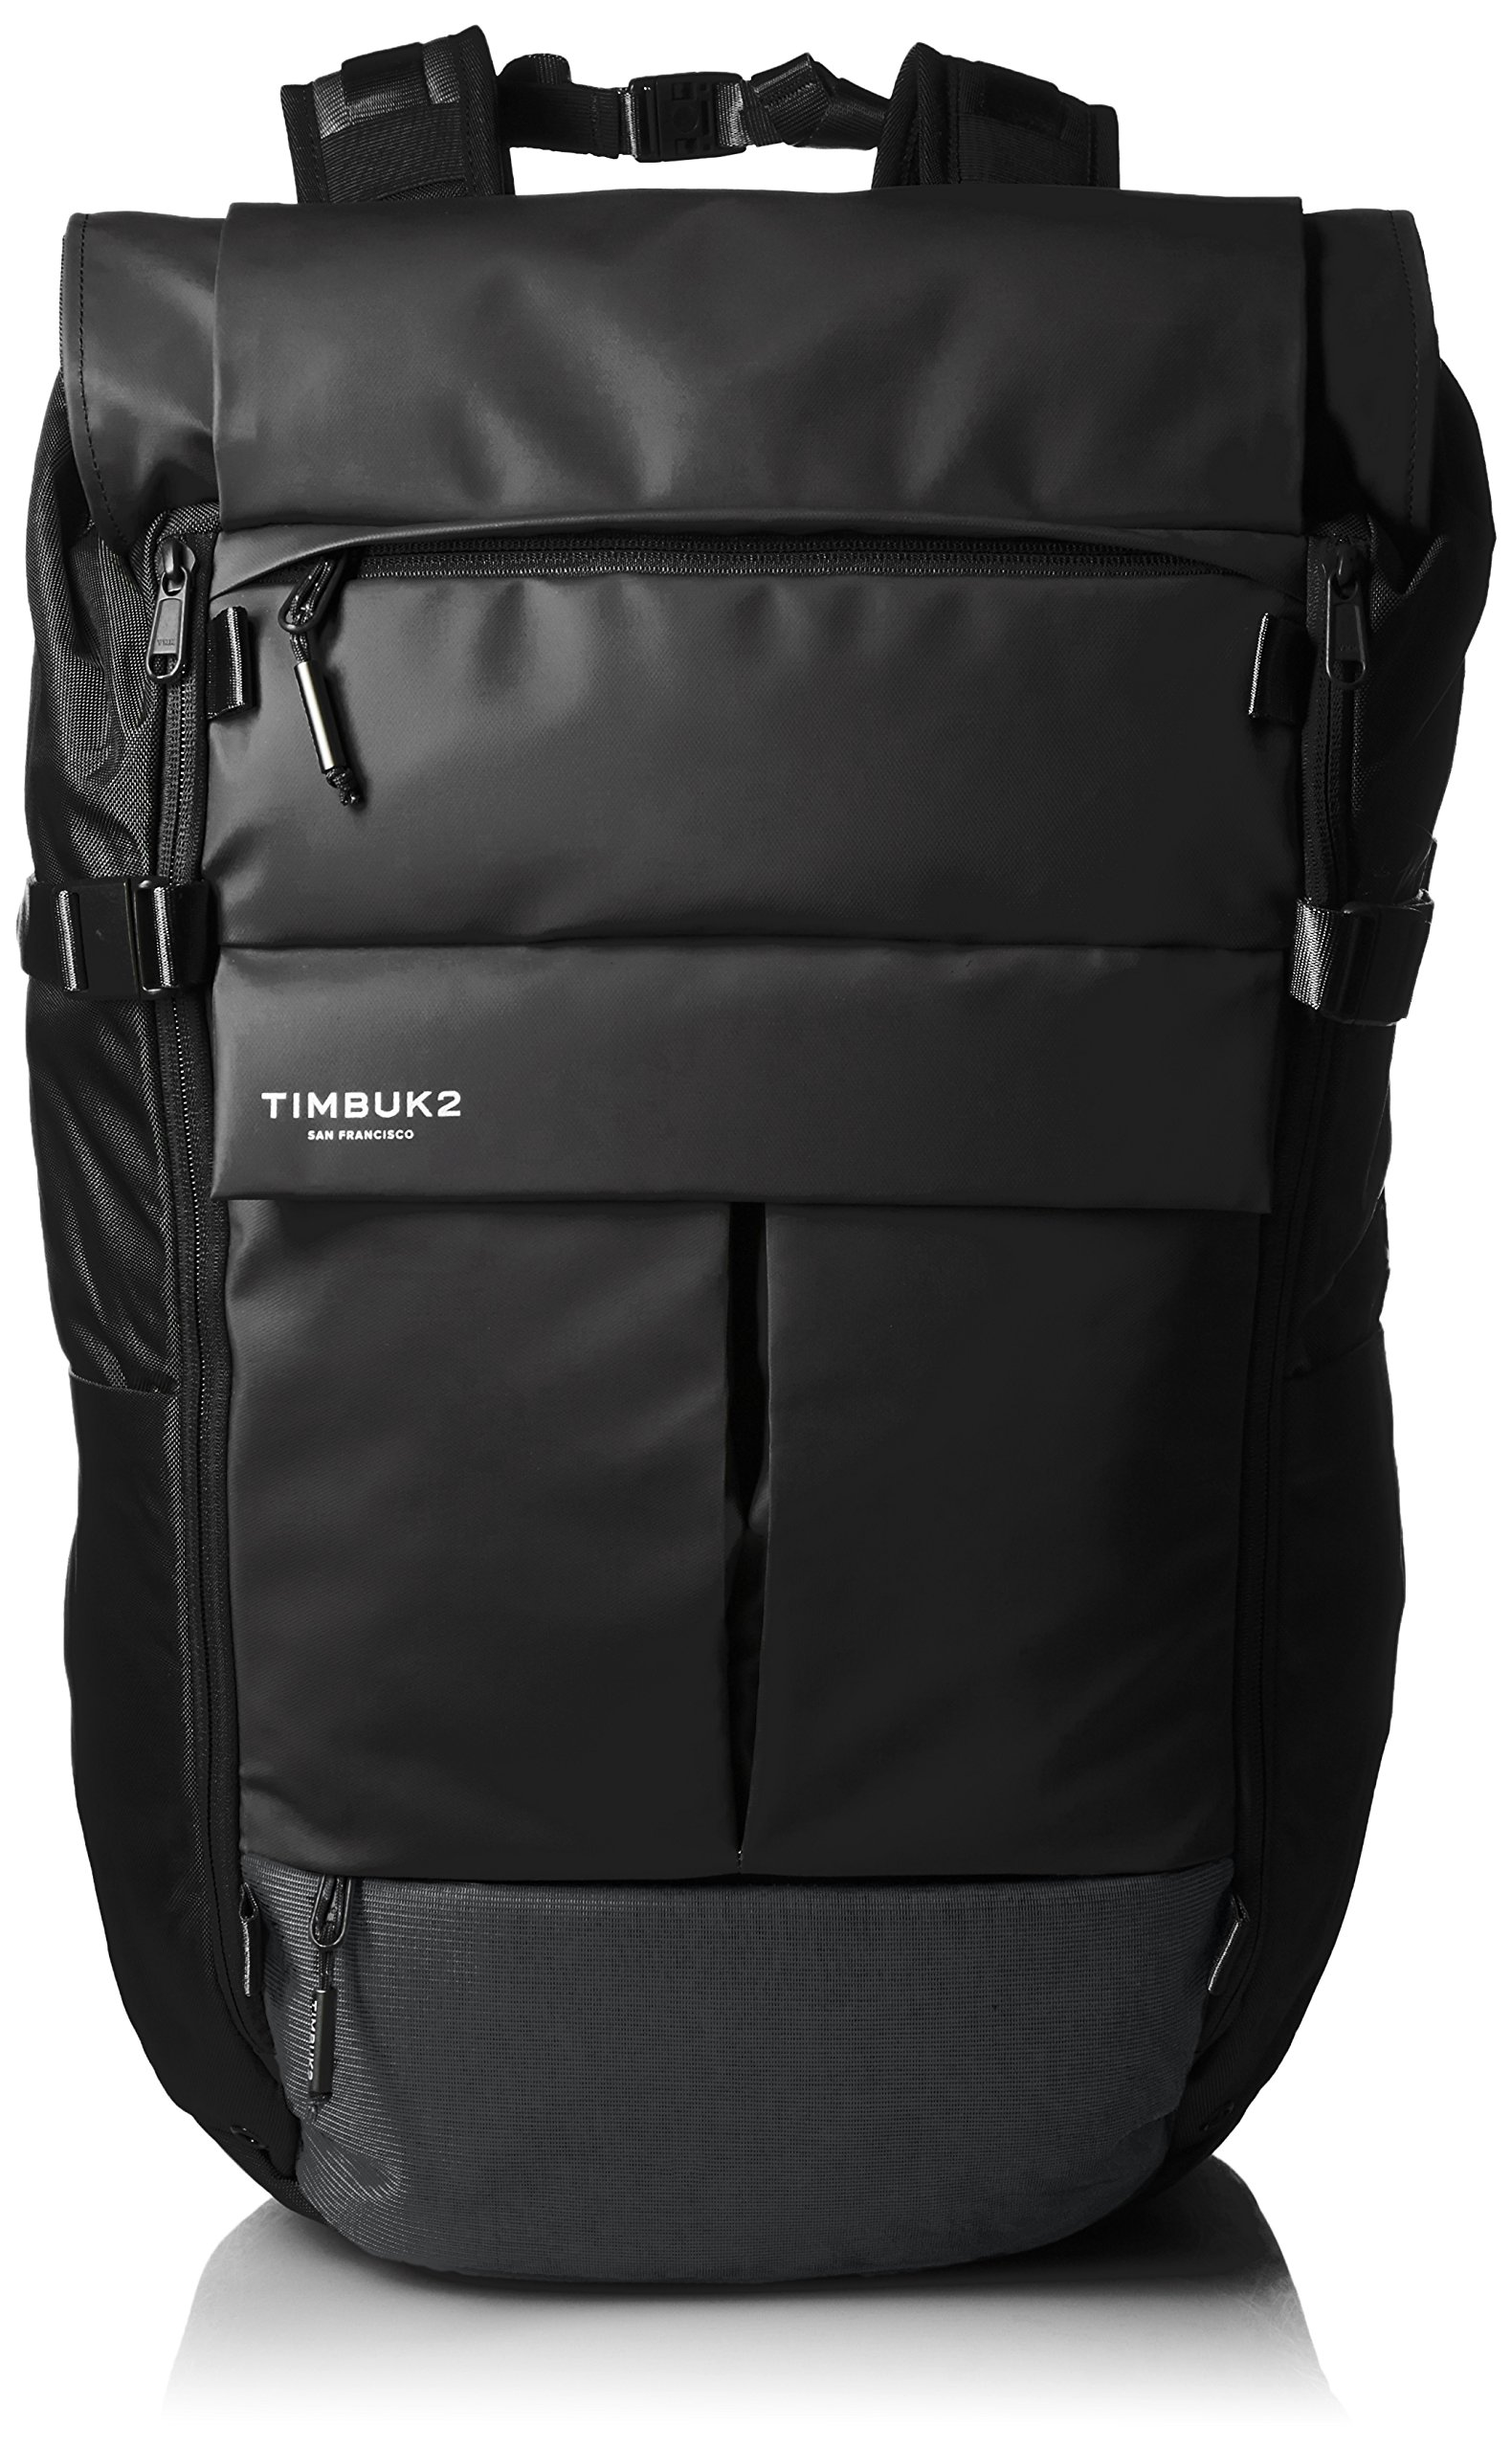 Timbuk2 Bruce Pack, Jet Black, One Size by Timbuk2